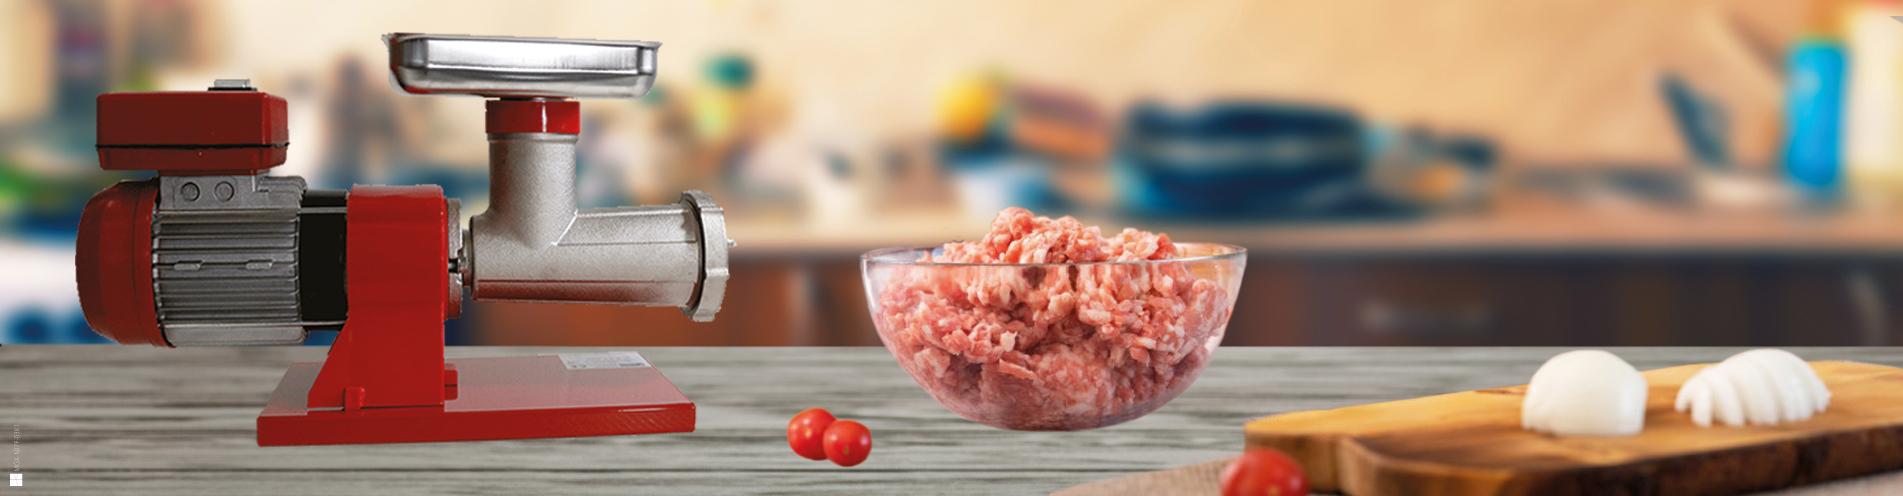 cast-iron-electric-meat-mincer-trit-g-22-0.8